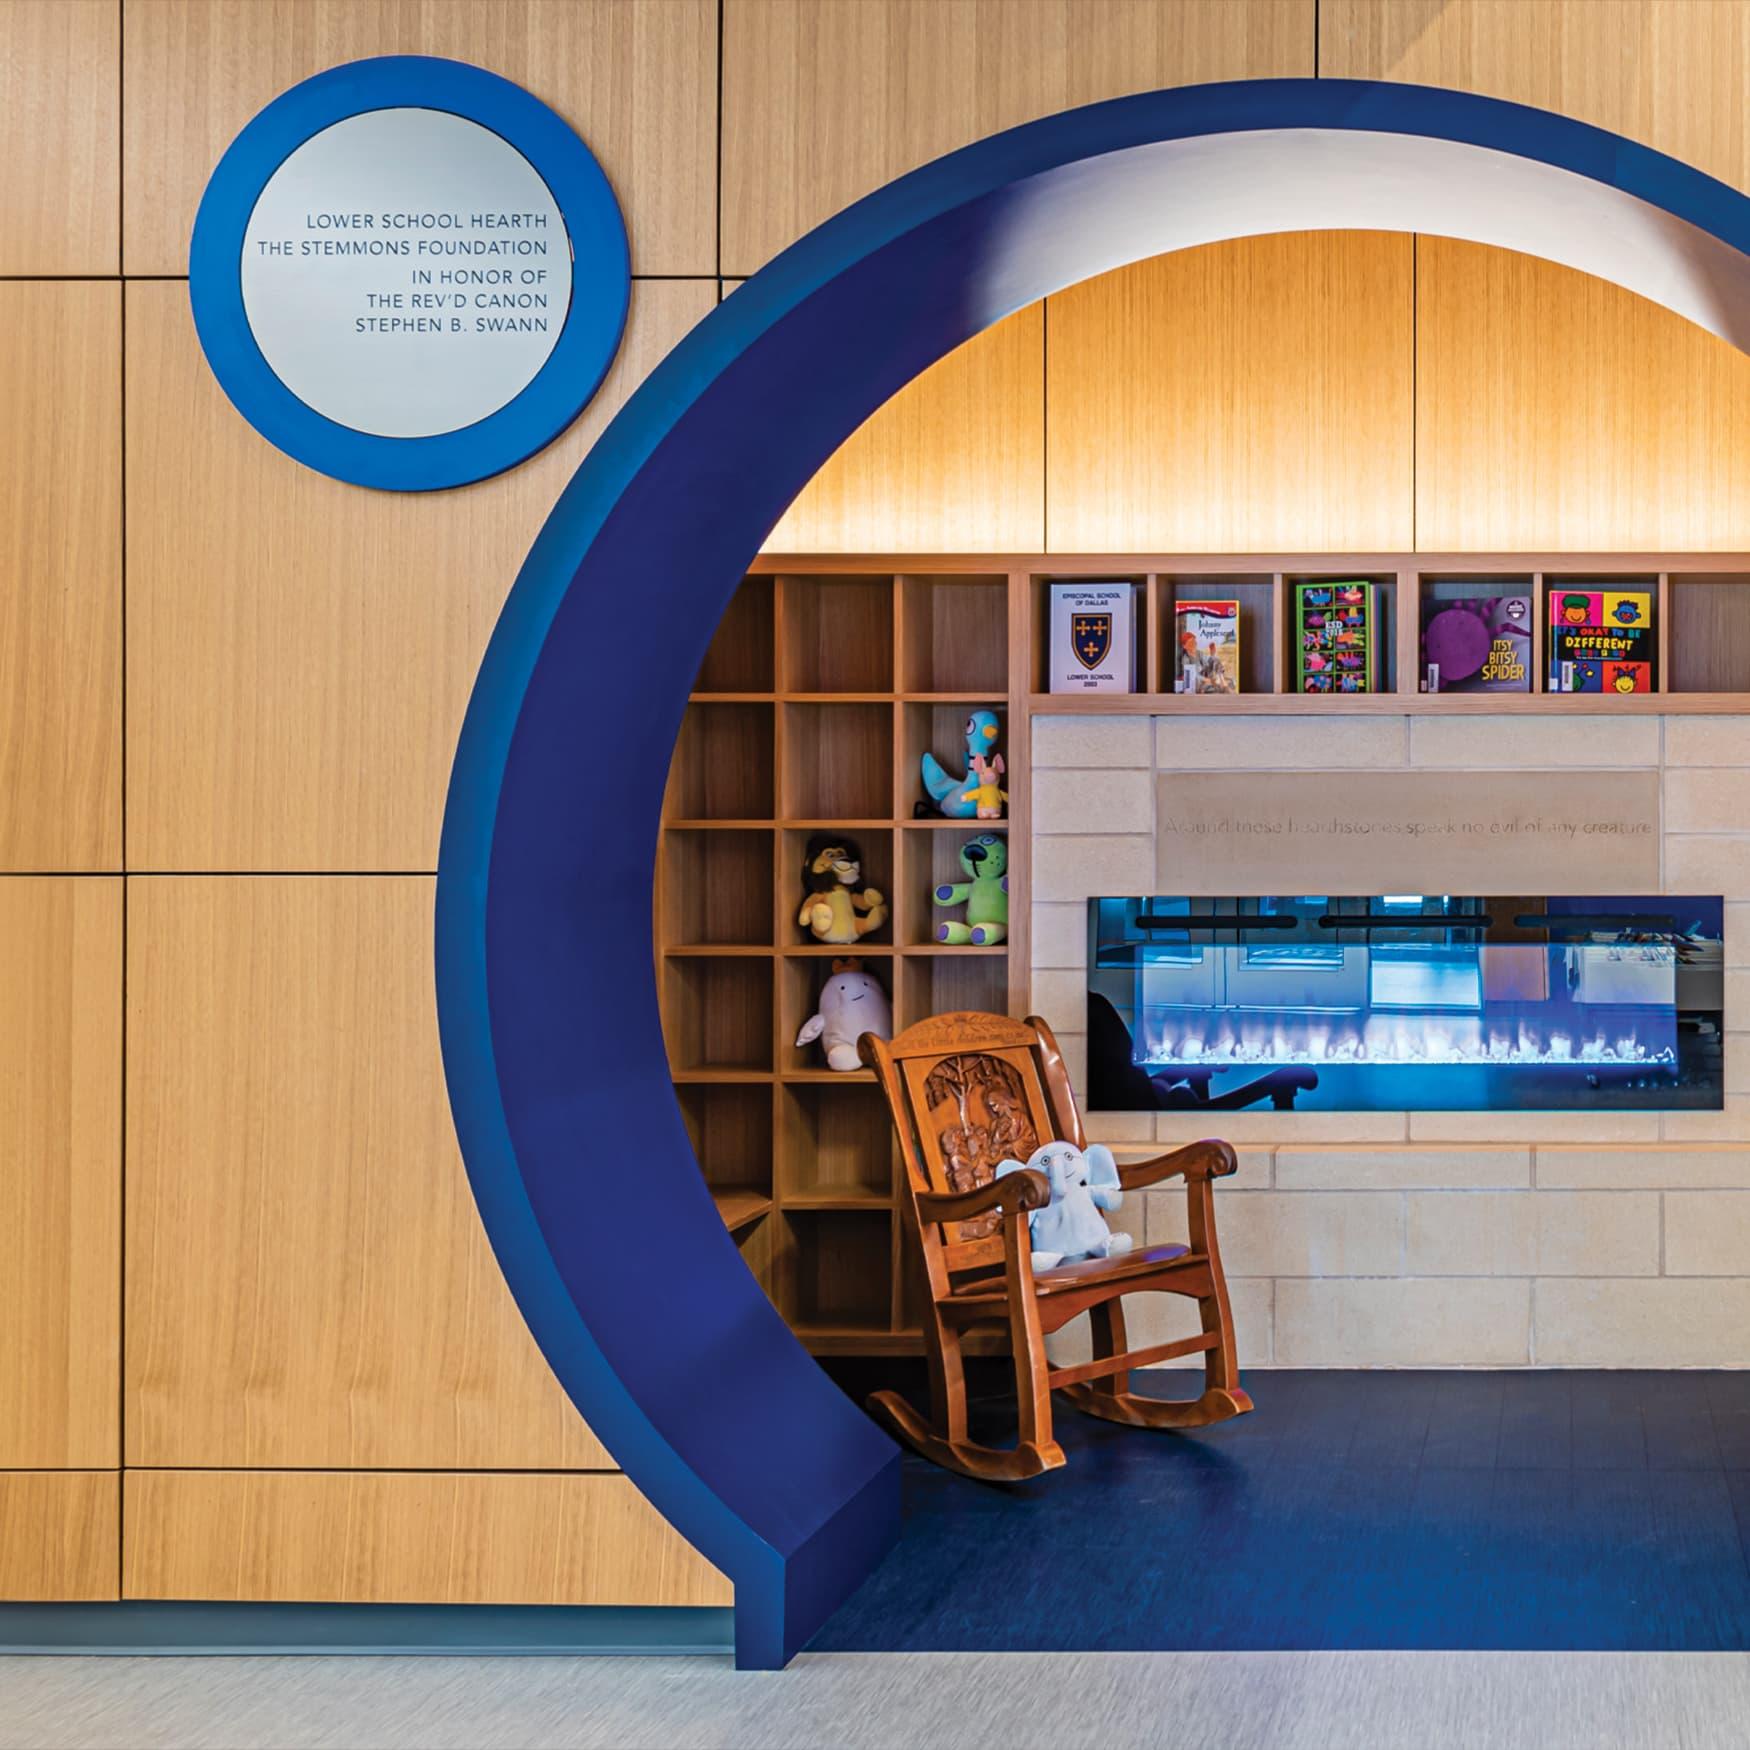 Children's medical center signage and interior design details